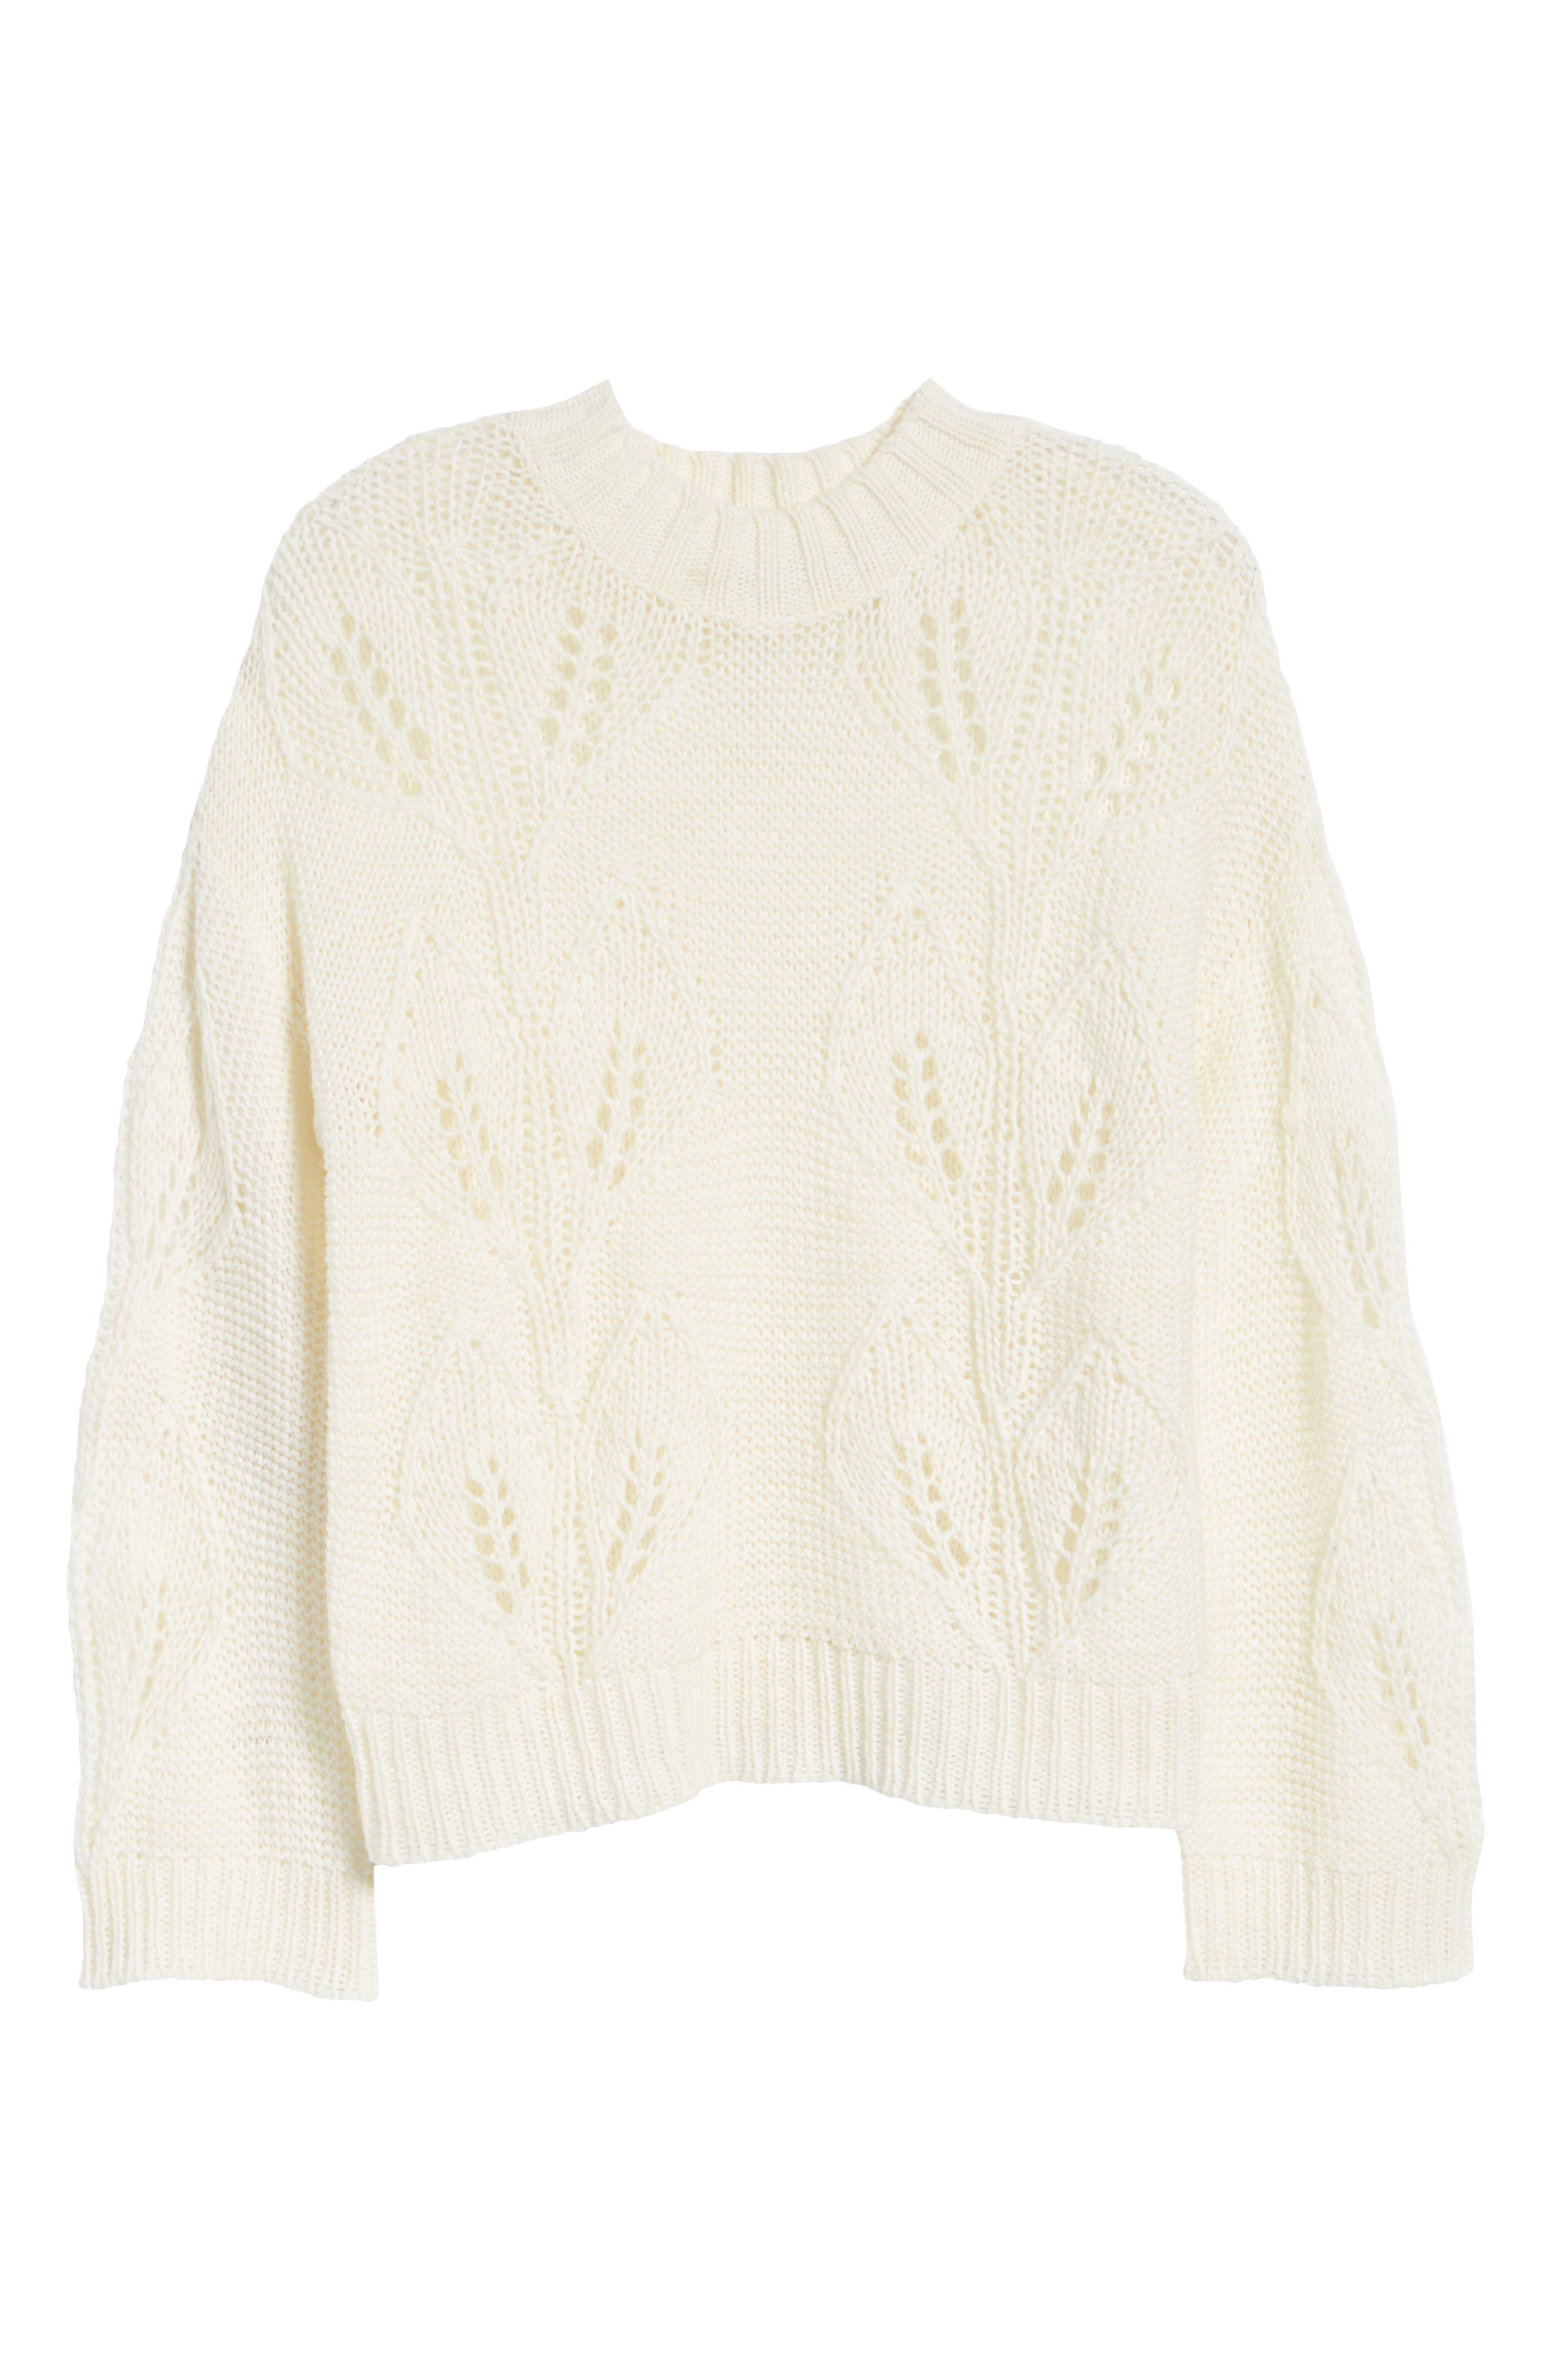 Bishop + Young Botanical Sweater,                             Alternate thumbnail 6, color,                             CREAM